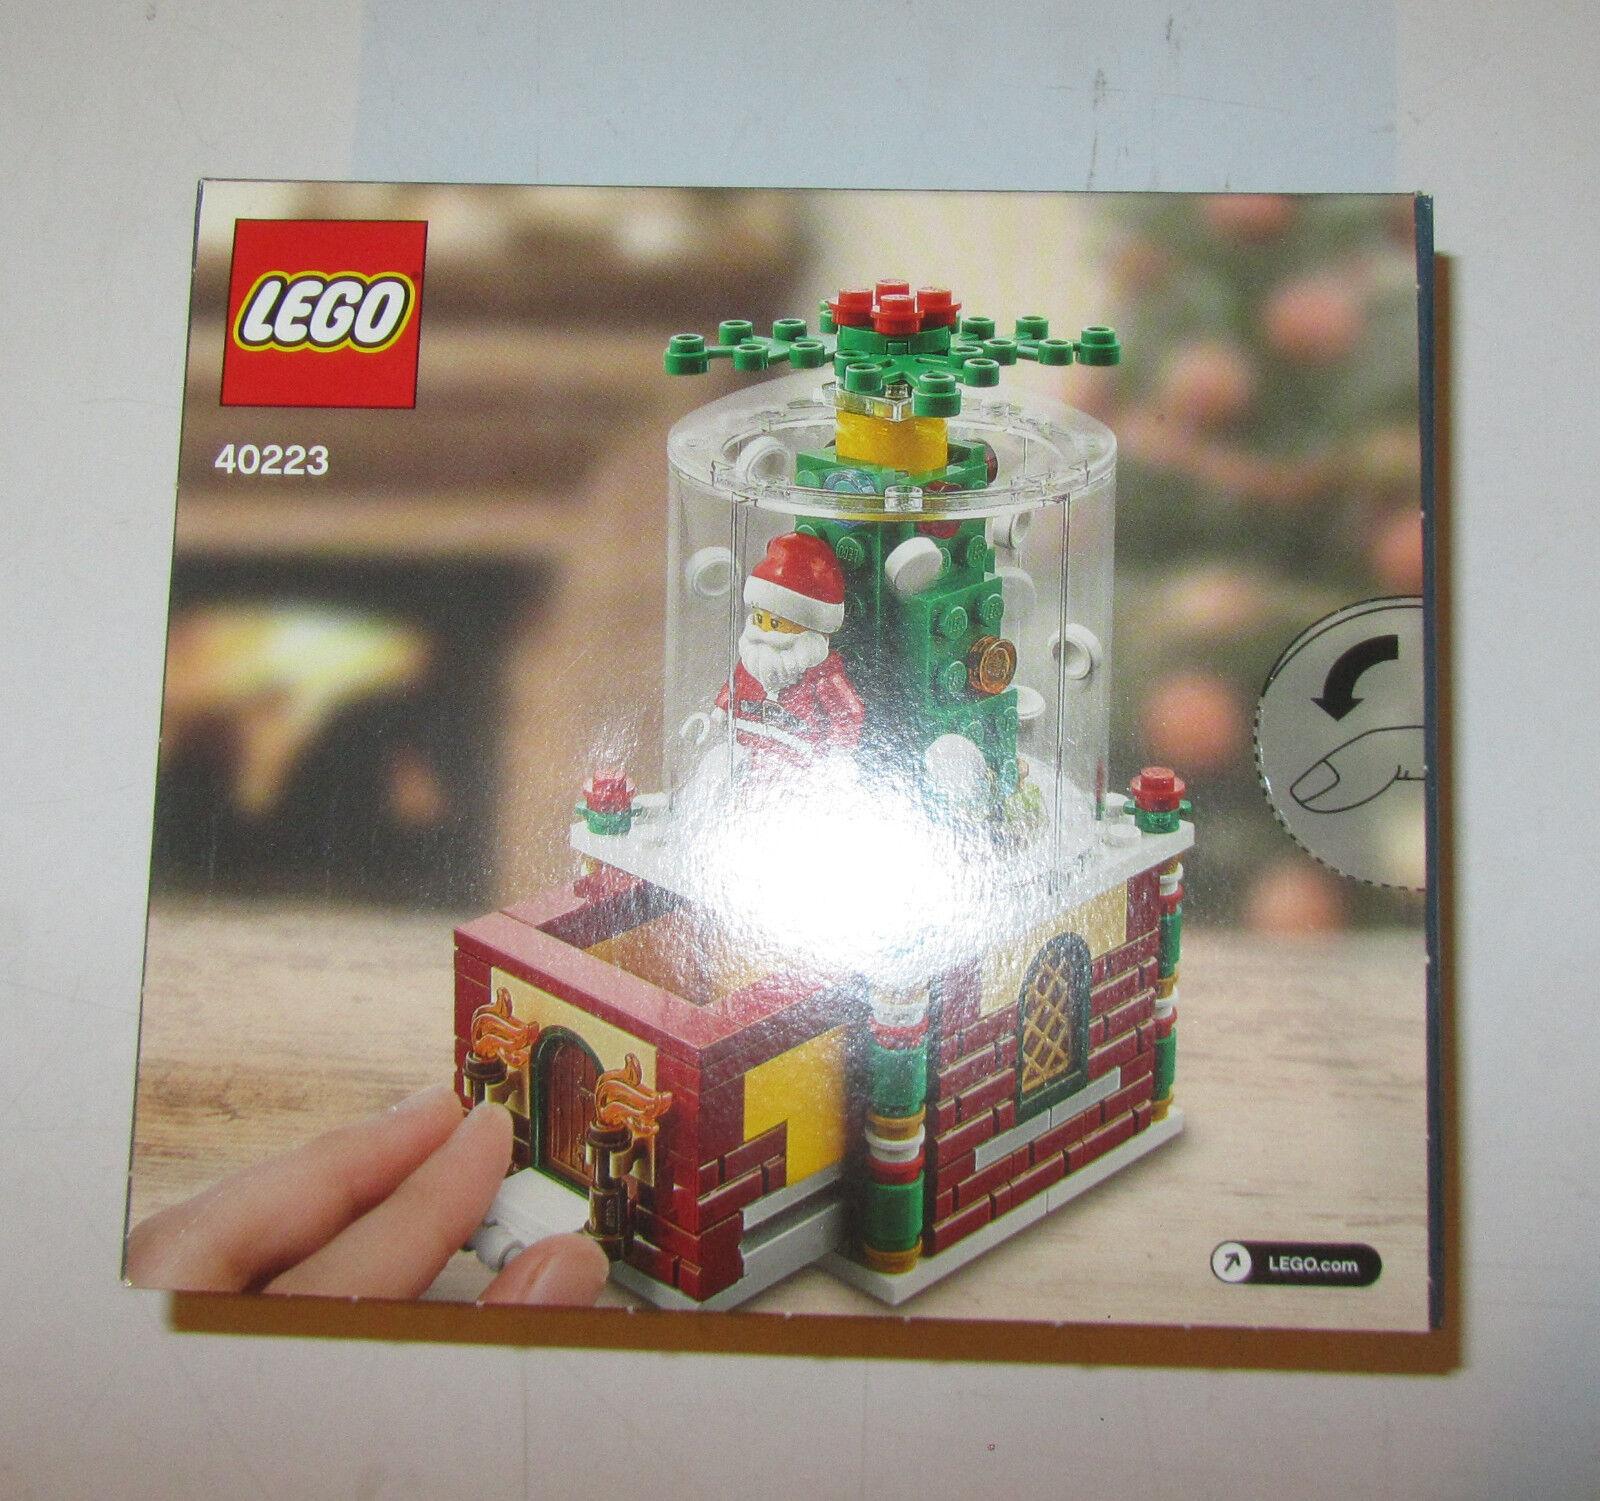 LEGO 40223 Globo di neve set natale 2016 Limited edition SPESE GRATIS